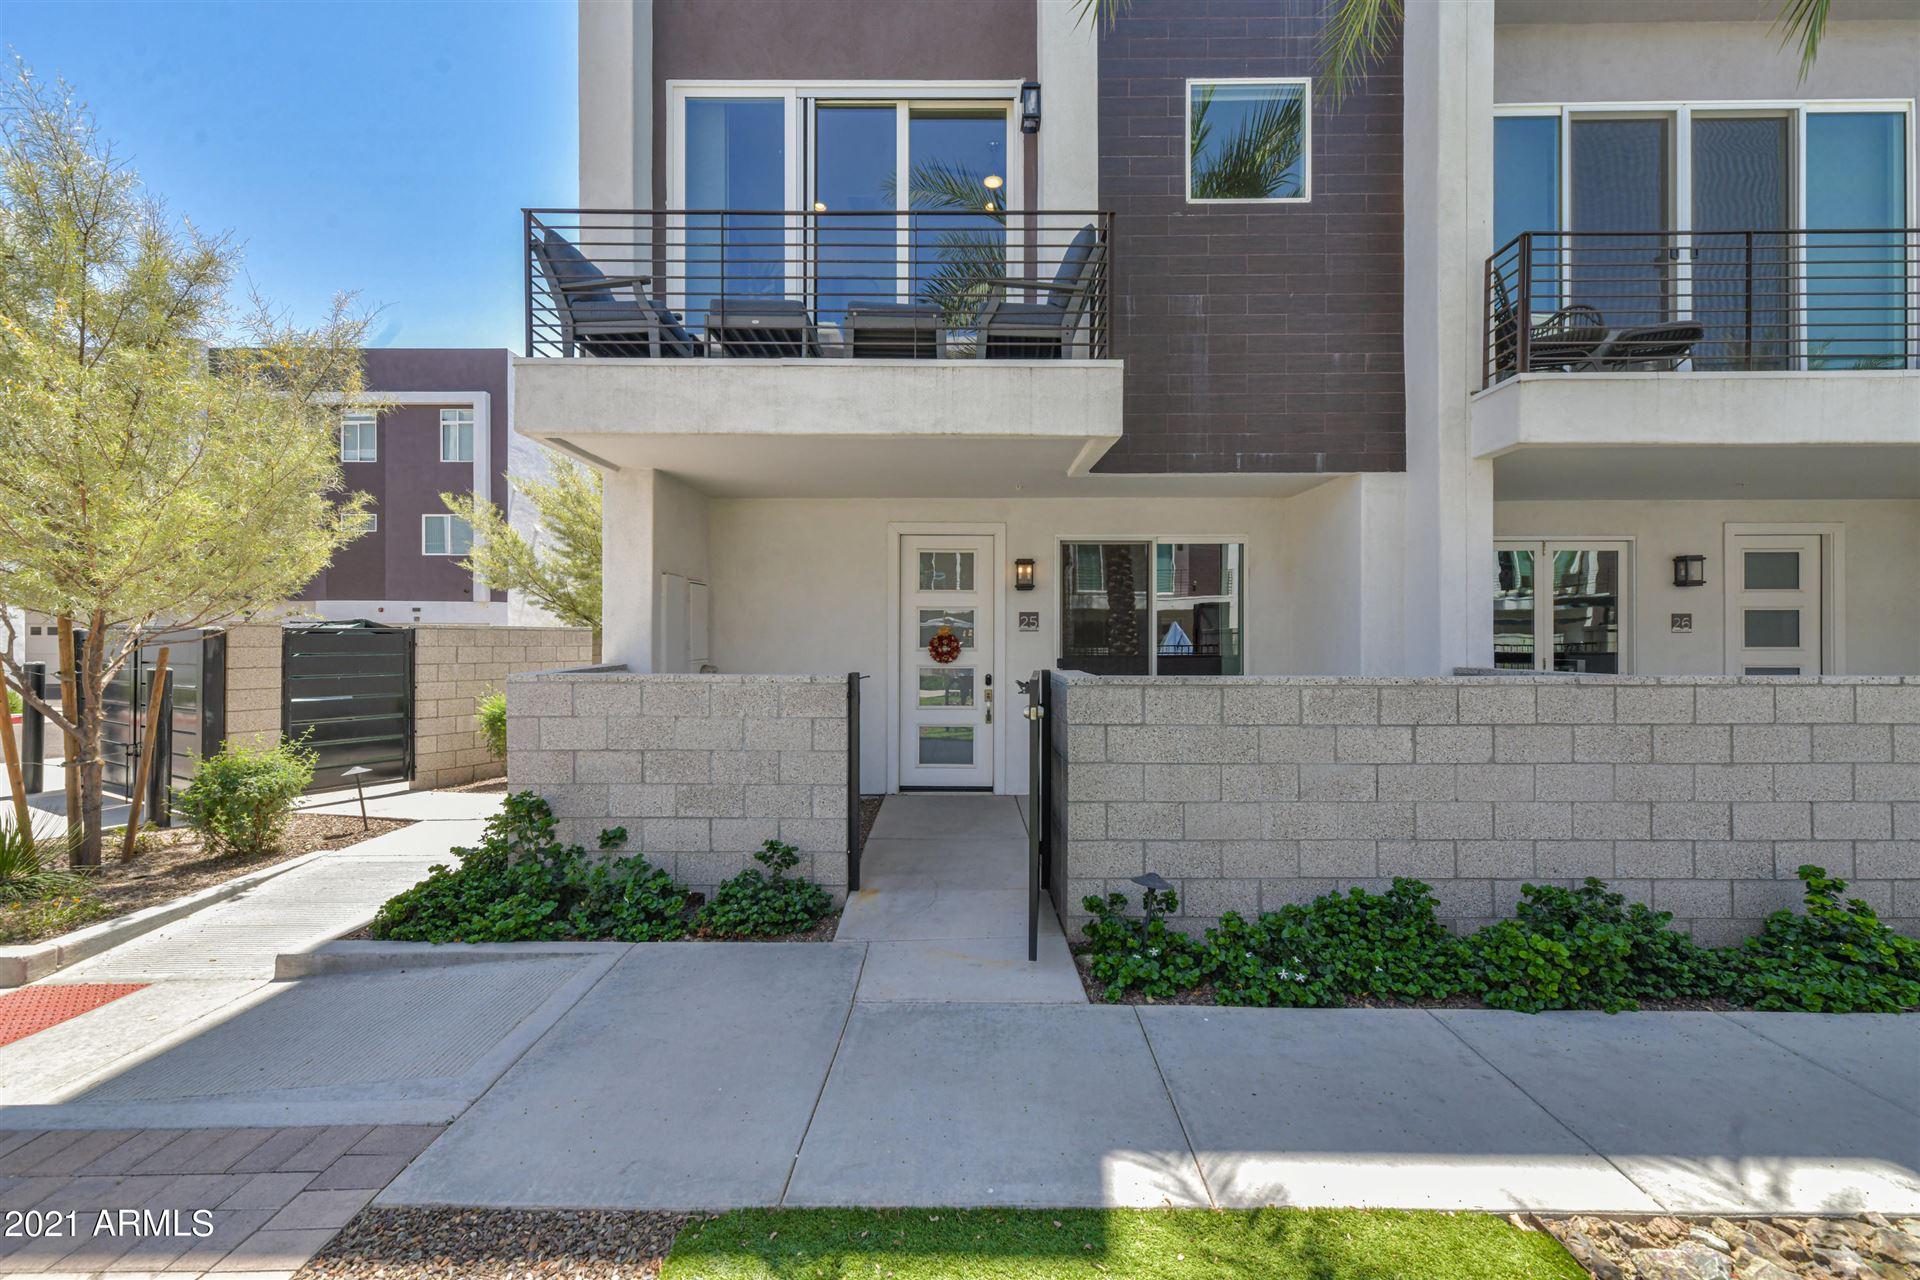 4444 N 25TH Street #25, Phoenix, AZ 85016 - MLS#: 6230997